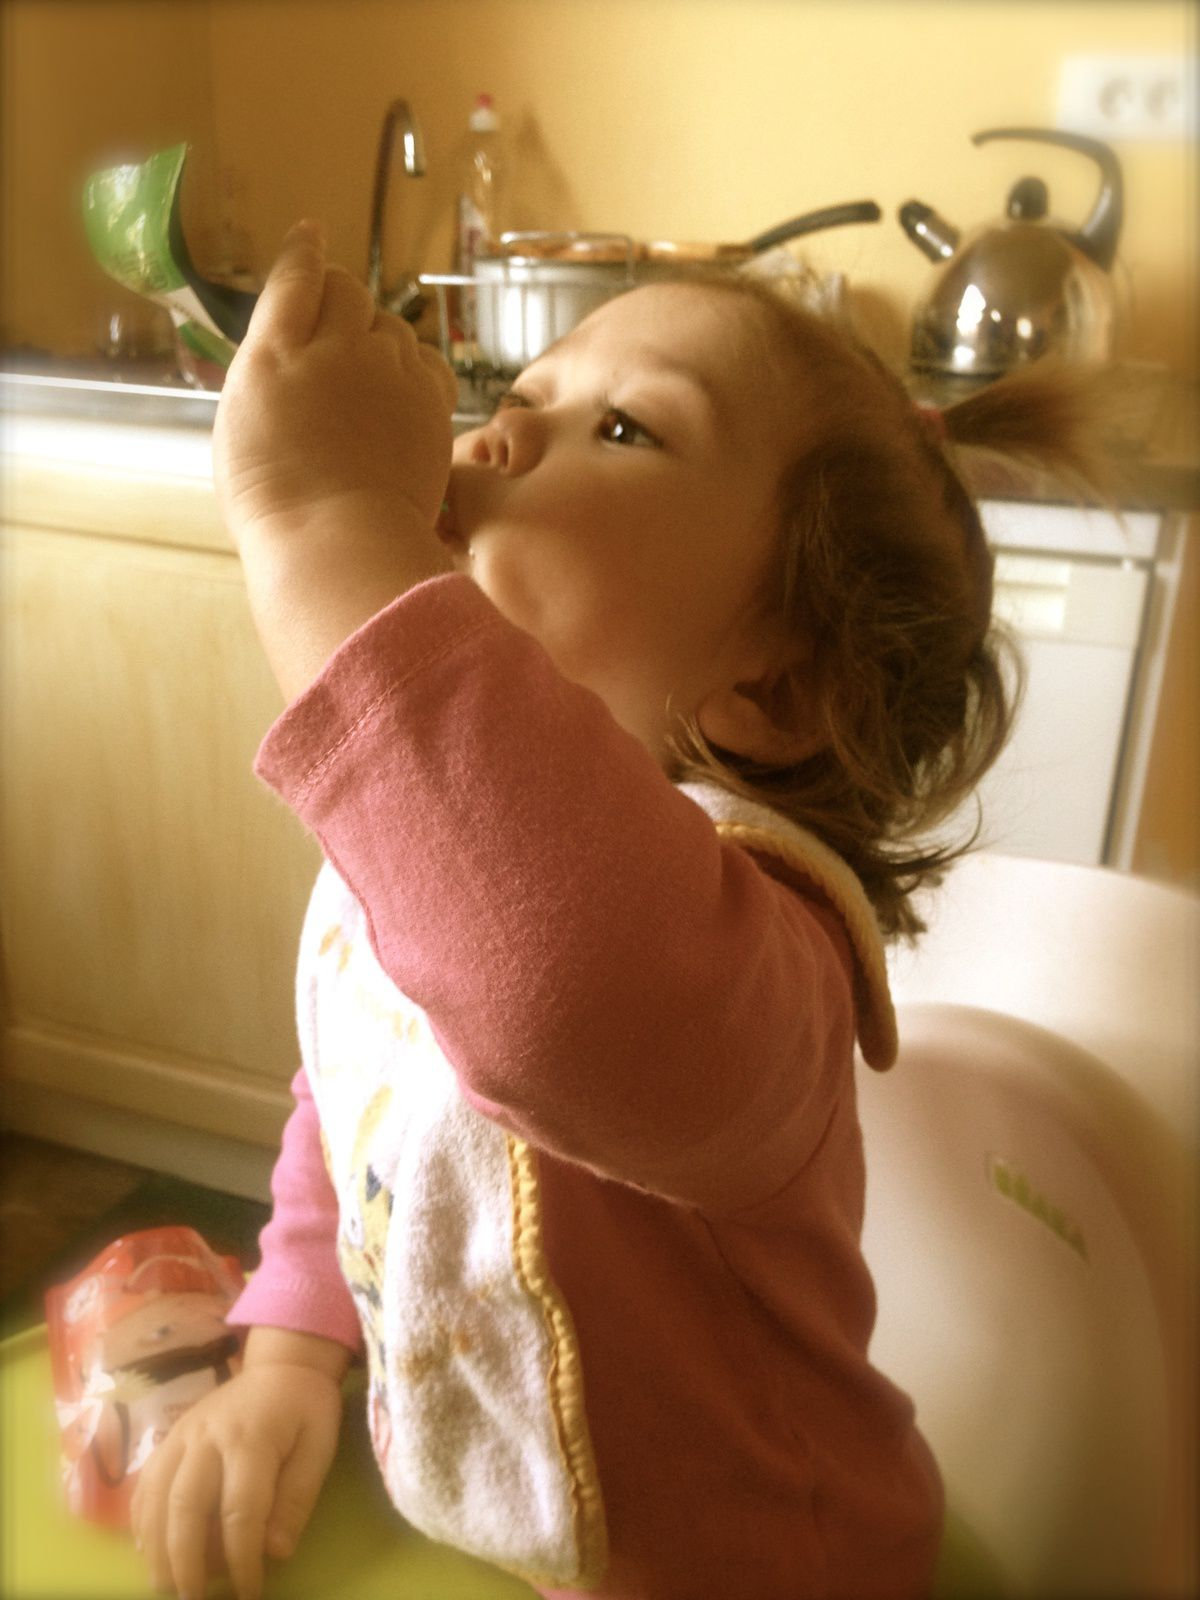 2. Manger sa pom'pote toute seule